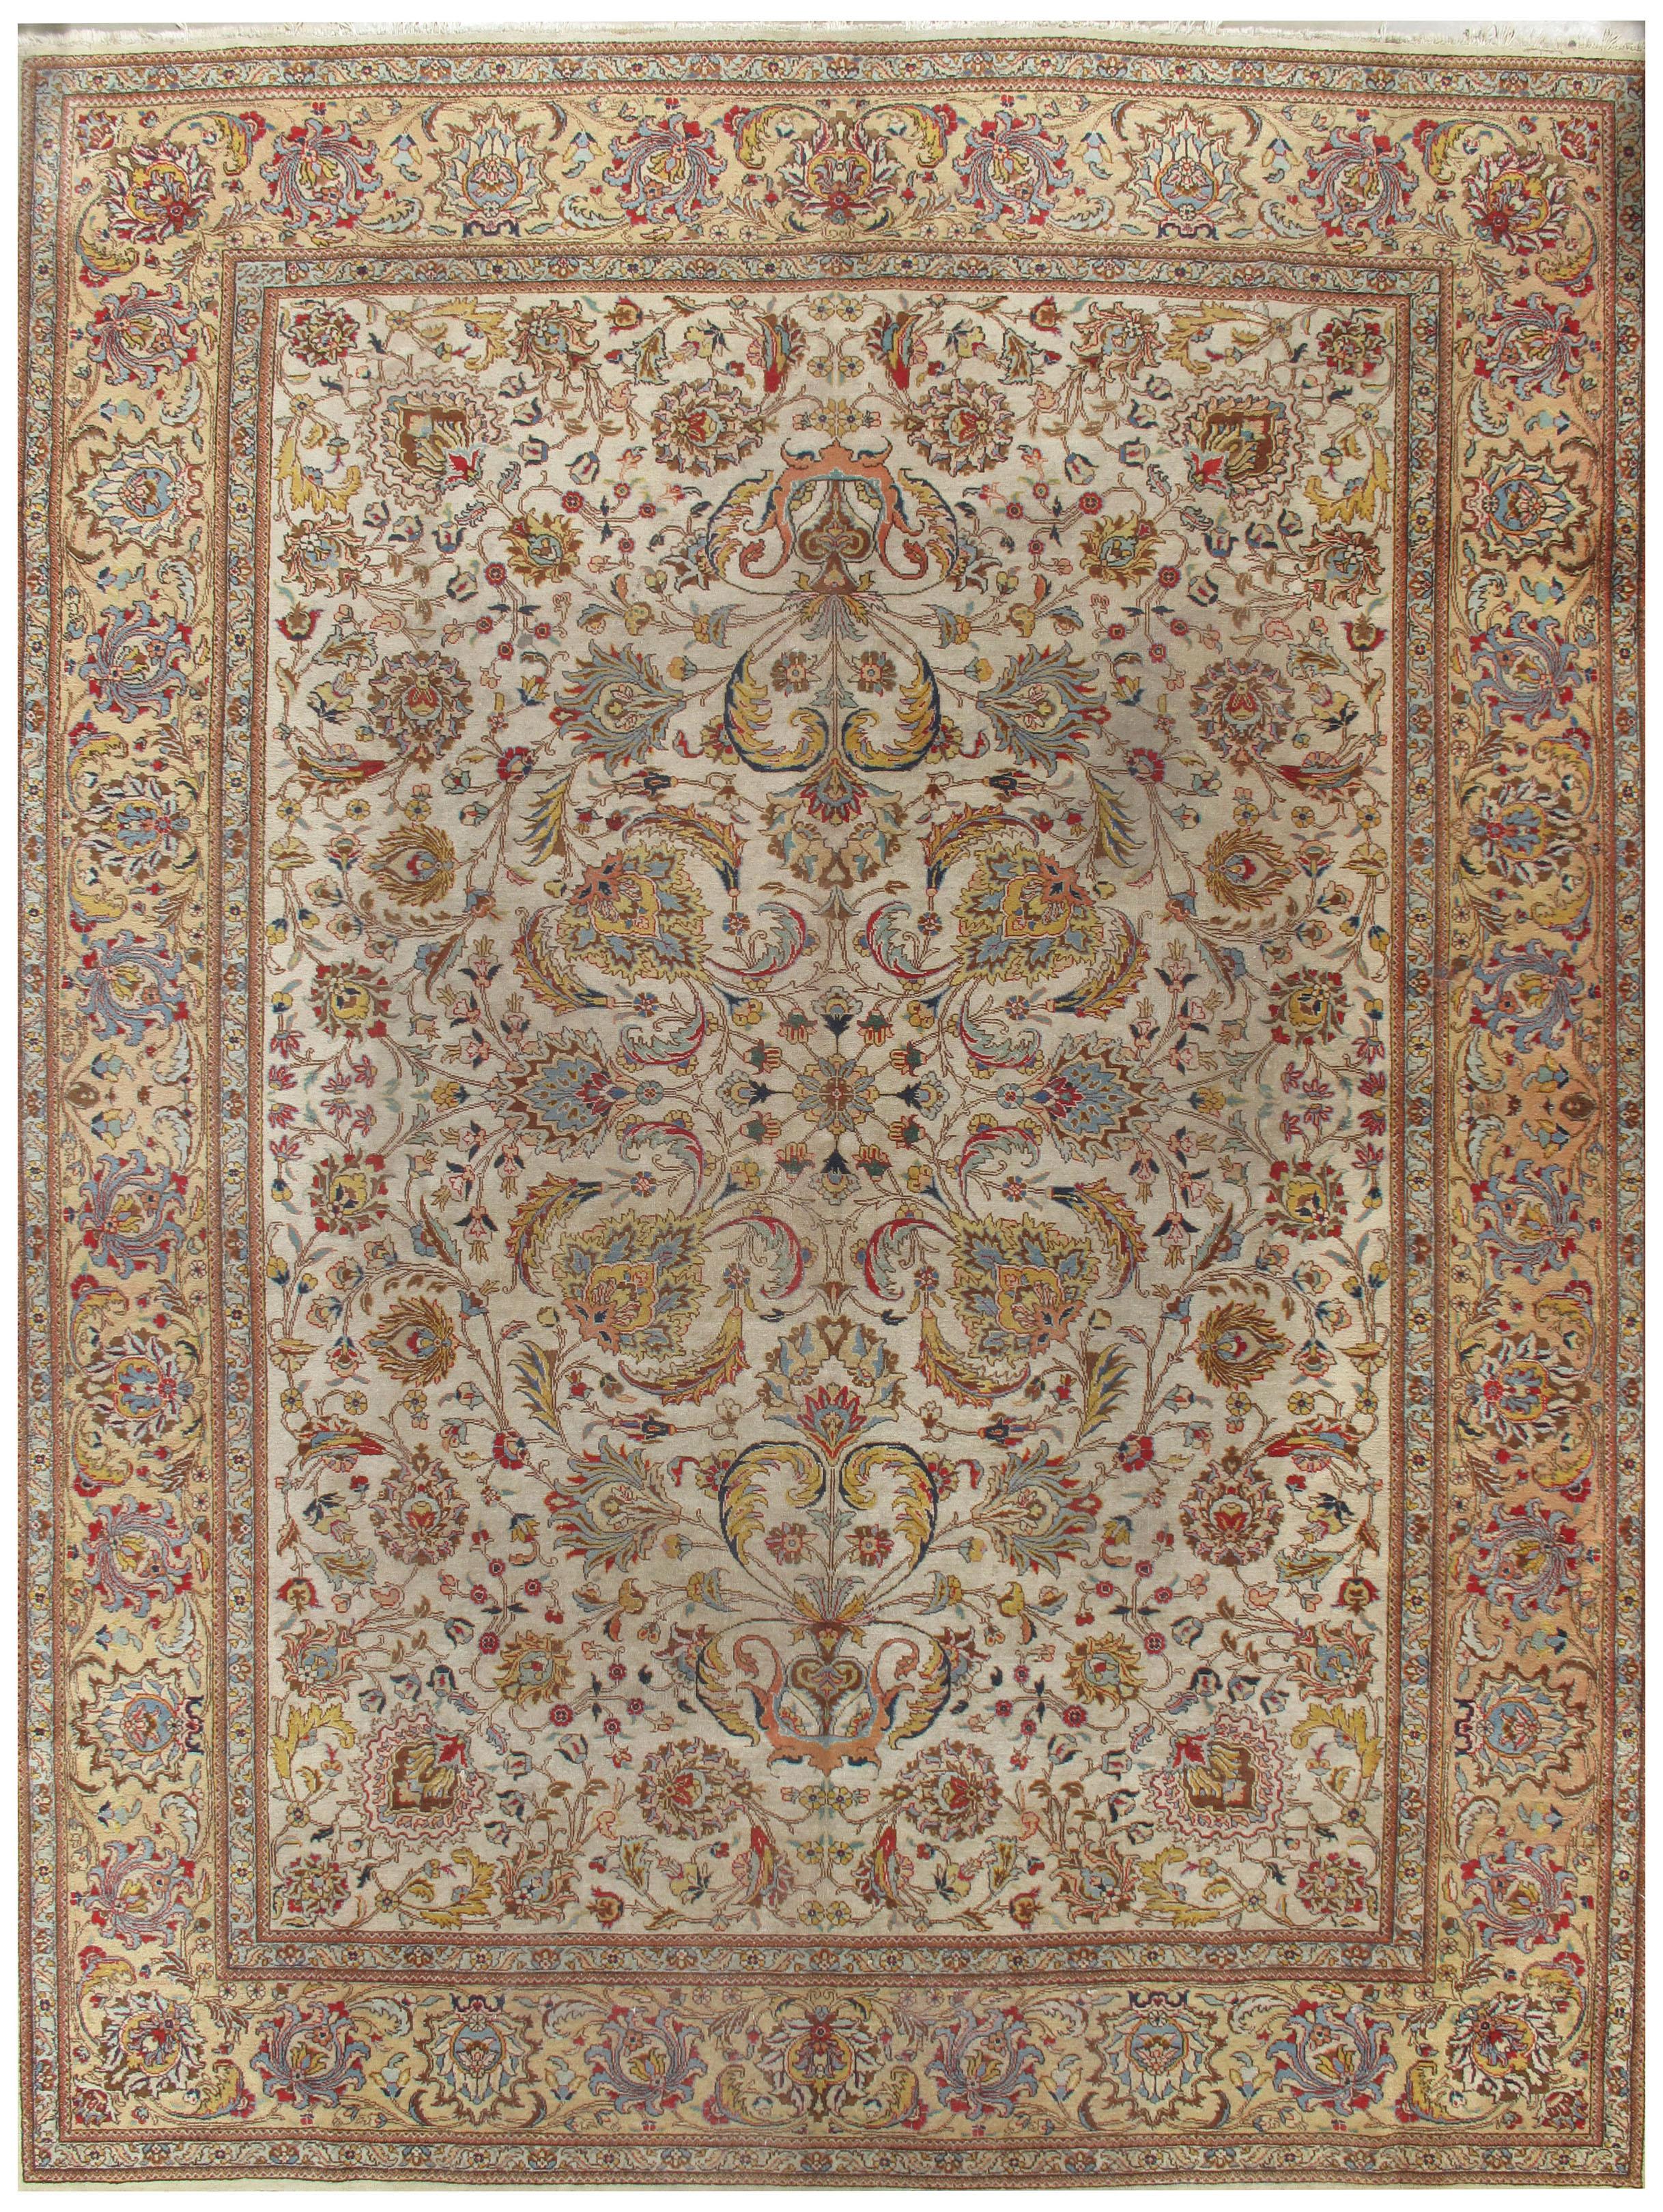 Vintage Lightly Distressed Tabriz Rug